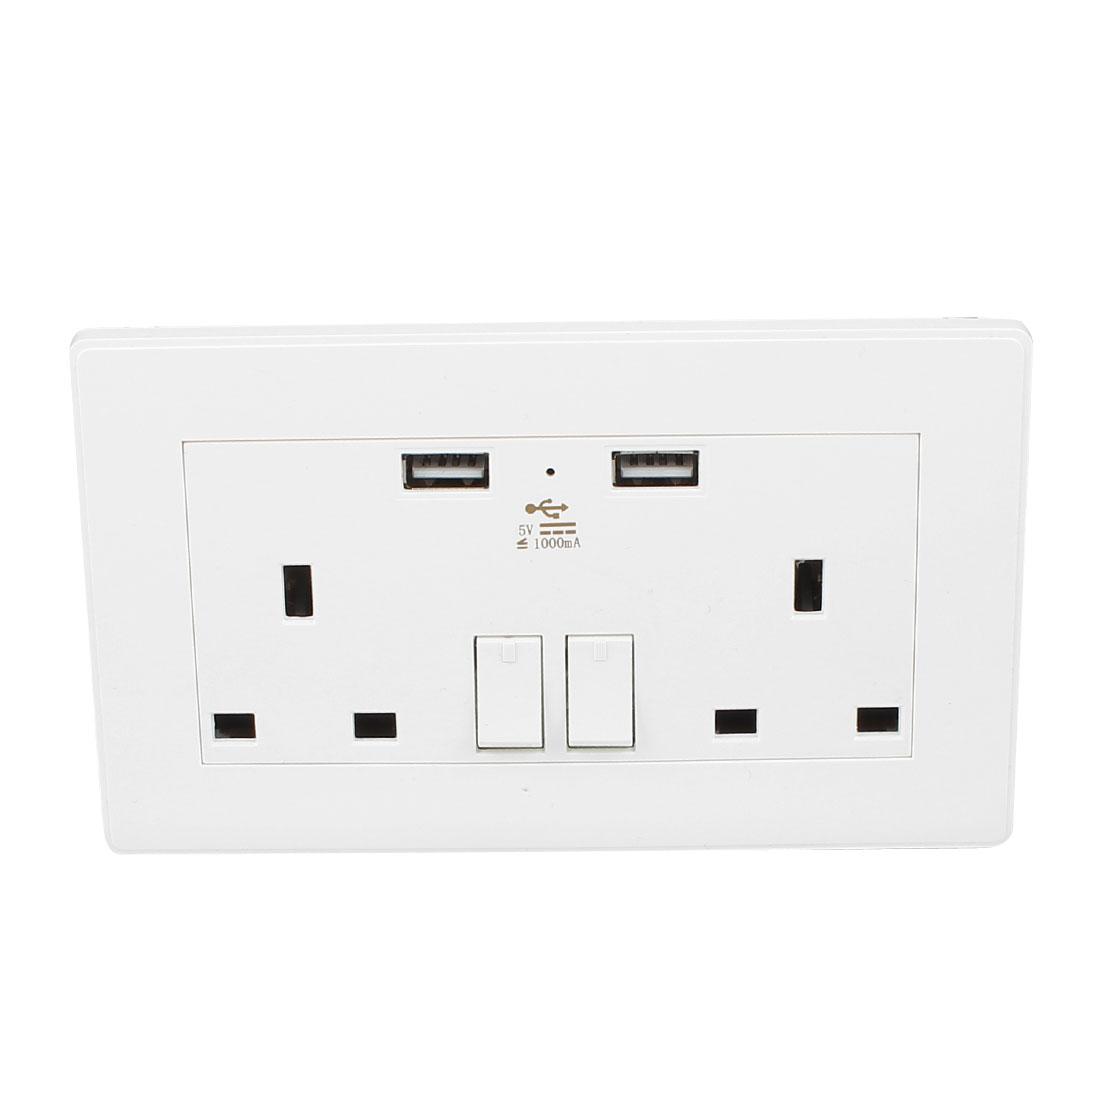 Dual AC 110V-250V UK Socket 2 USB Port Charging DC 5V 1000mA Mains Power Switch Wall Outlet